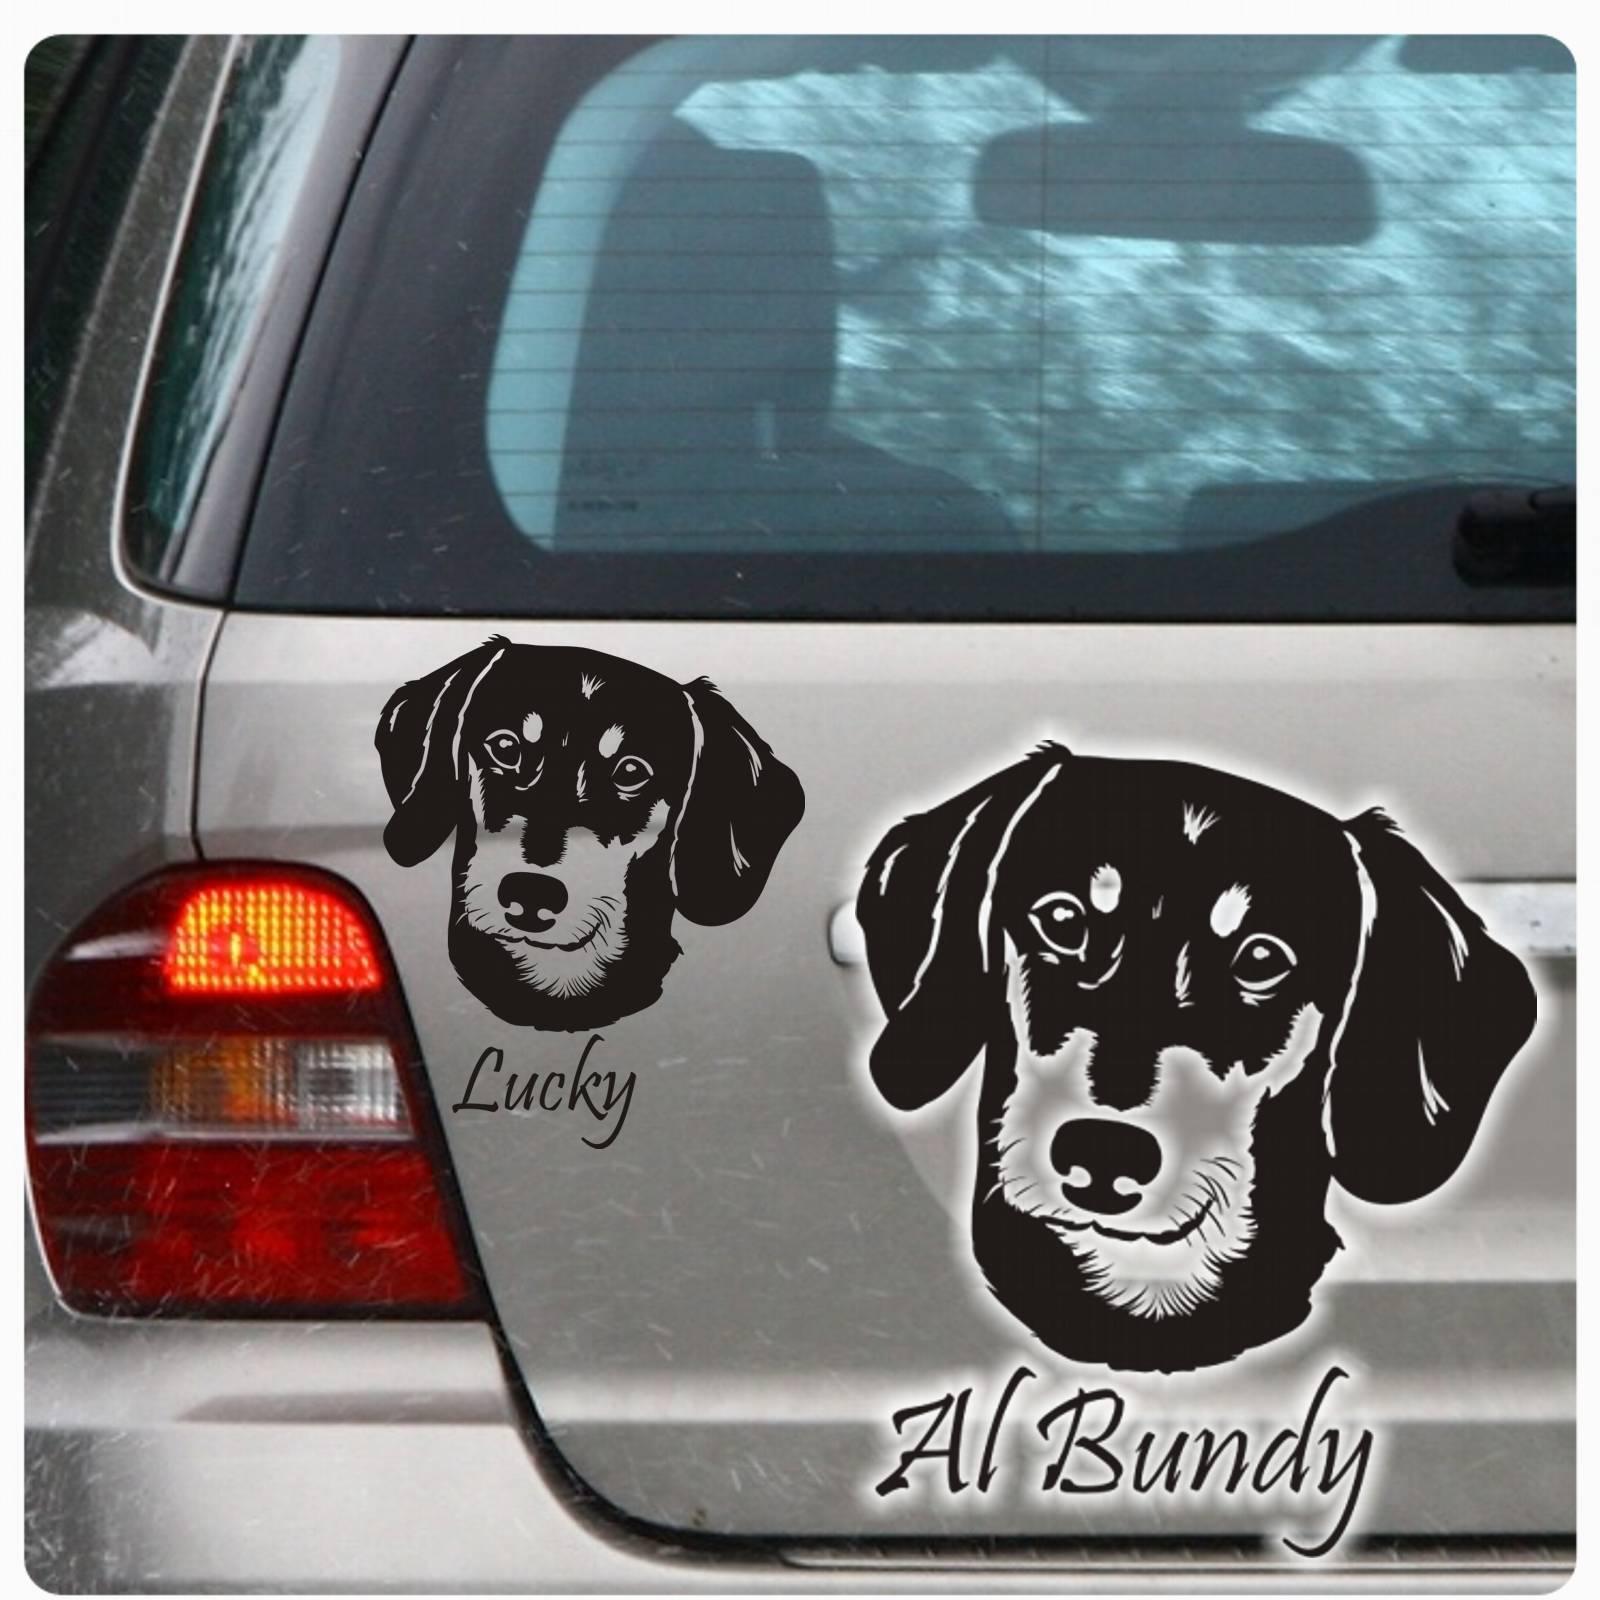 dackel name aufkleber autoaufkleber hund auto kurzhaar sticker teckel a1622 ebay. Black Bedroom Furniture Sets. Home Design Ideas